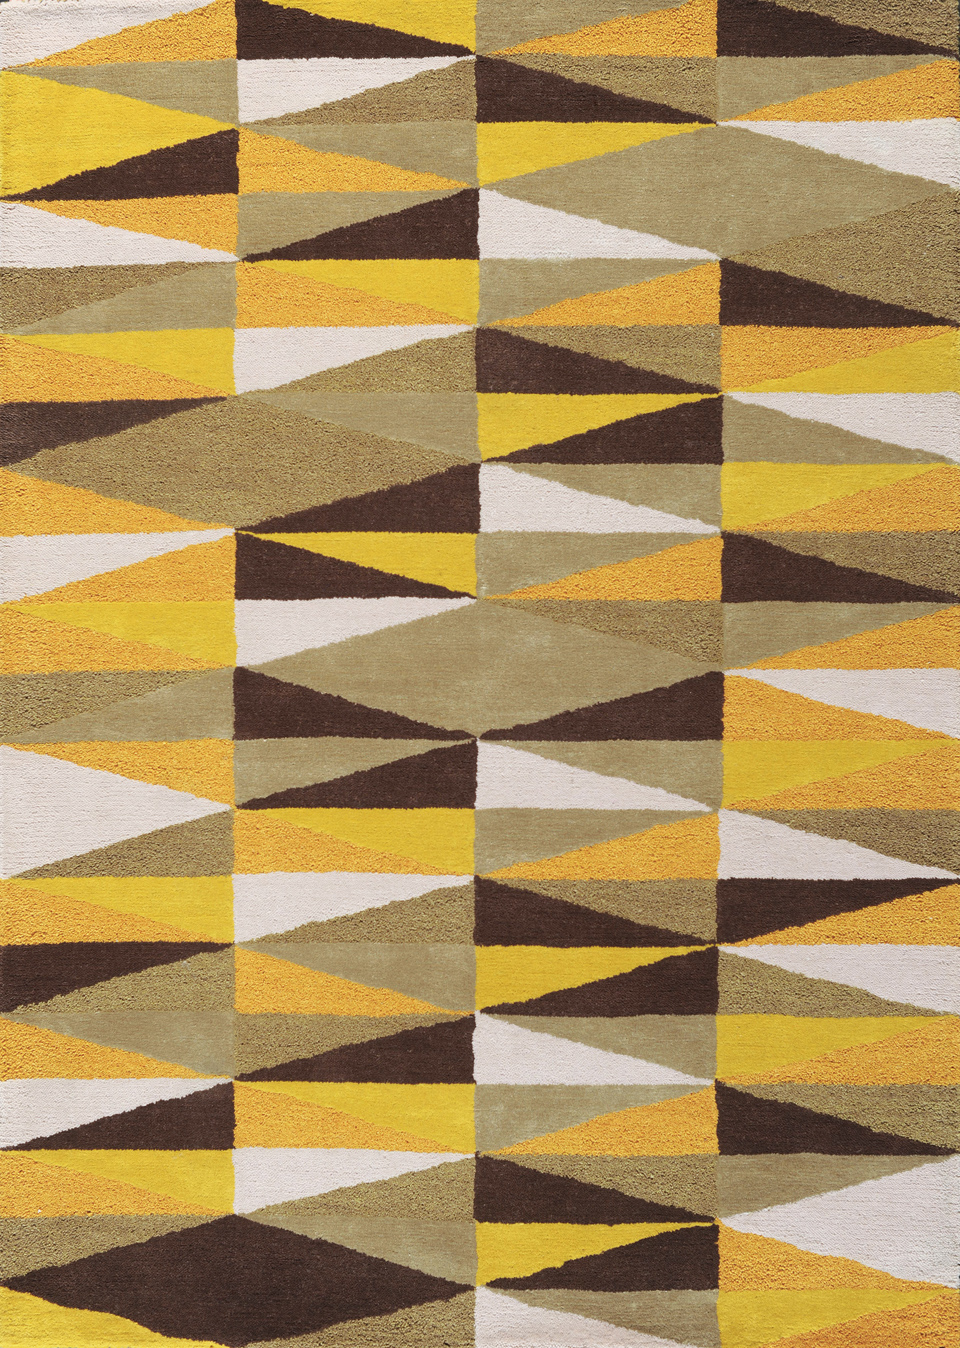 Carrelage design tapis gris et jaune moderne design for Tapis salon jaune et gris